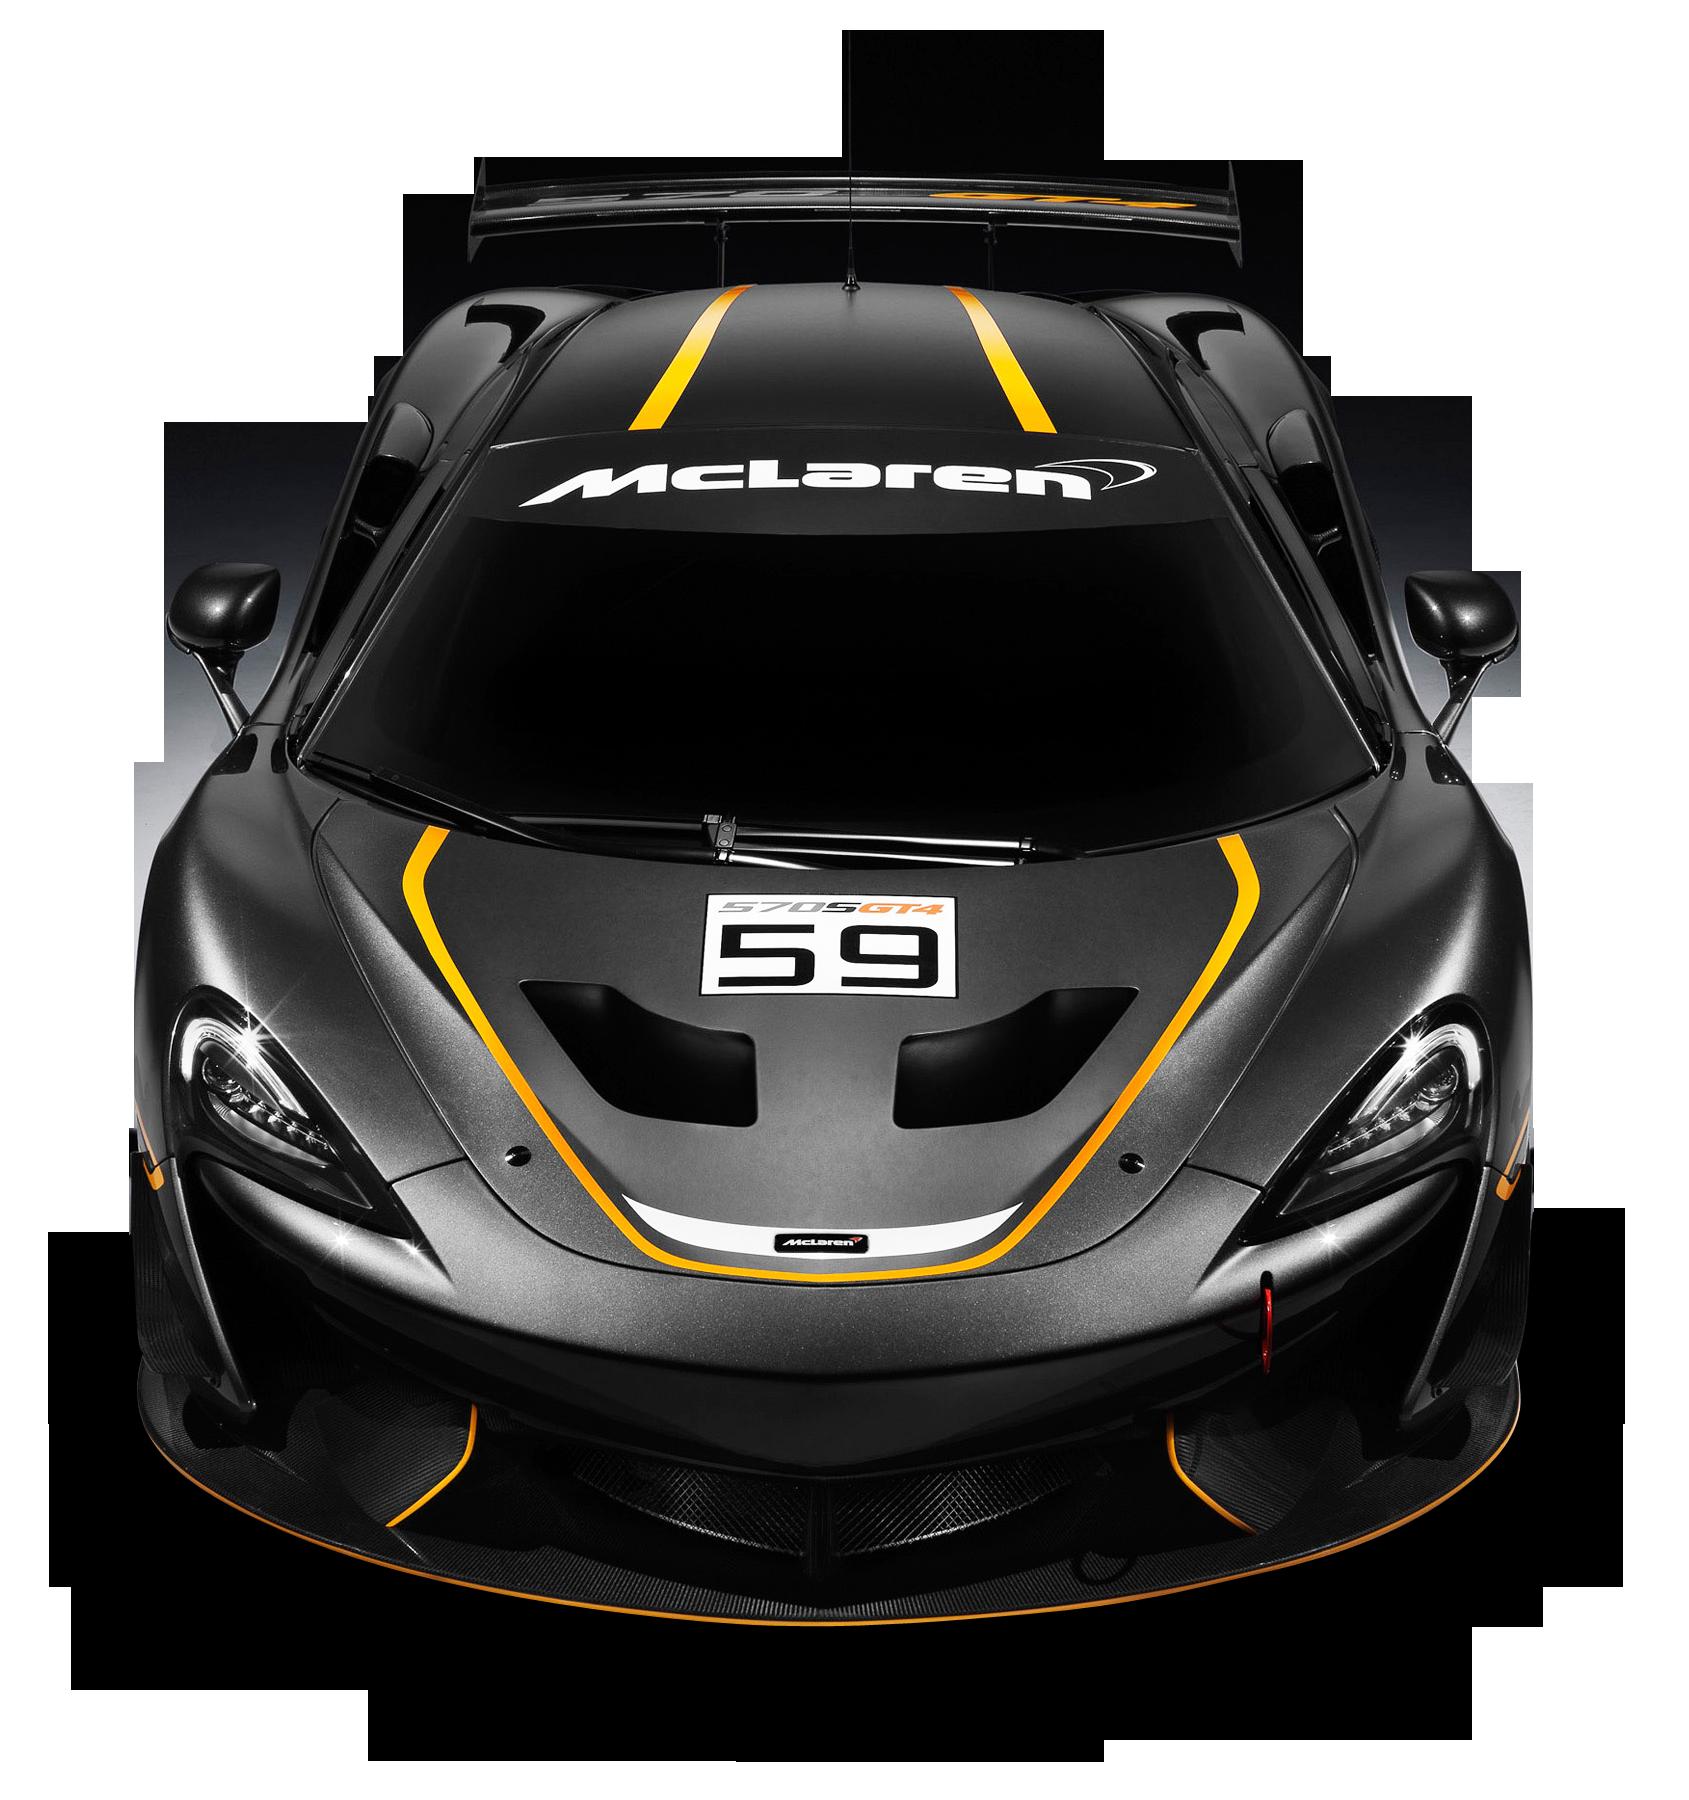 Black Mclaren 570s Gt4 Race Car Png Image Mclaren Race Cars Black Mercedes Benz